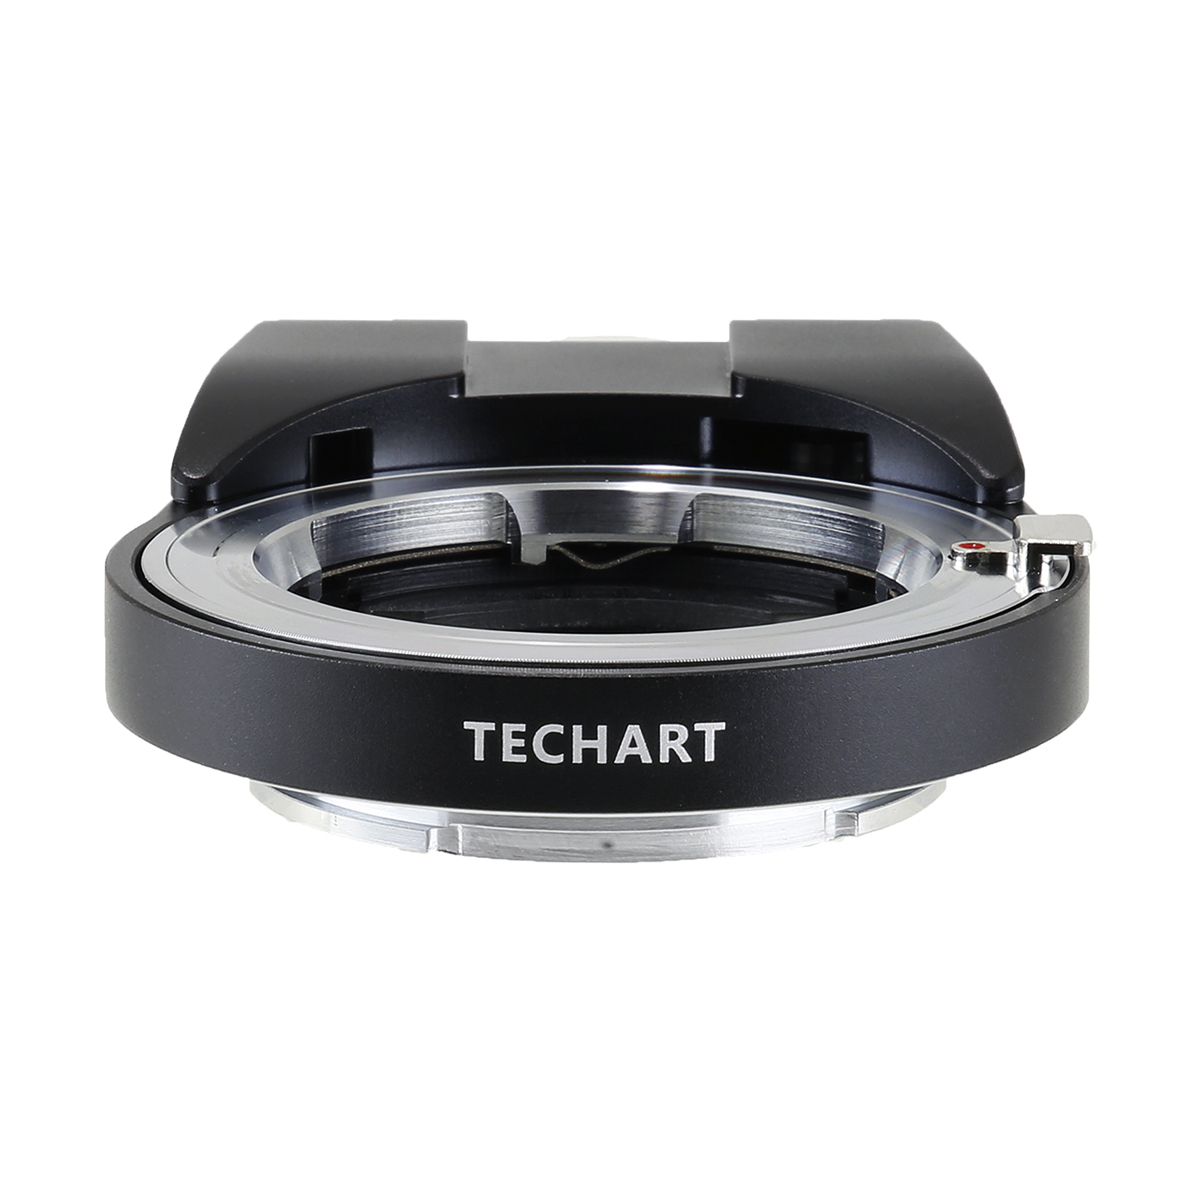 TECHART(テックアート)LM-EA7 ライカMマウントレンズ - ソニーα.Eマウント電子アダプター